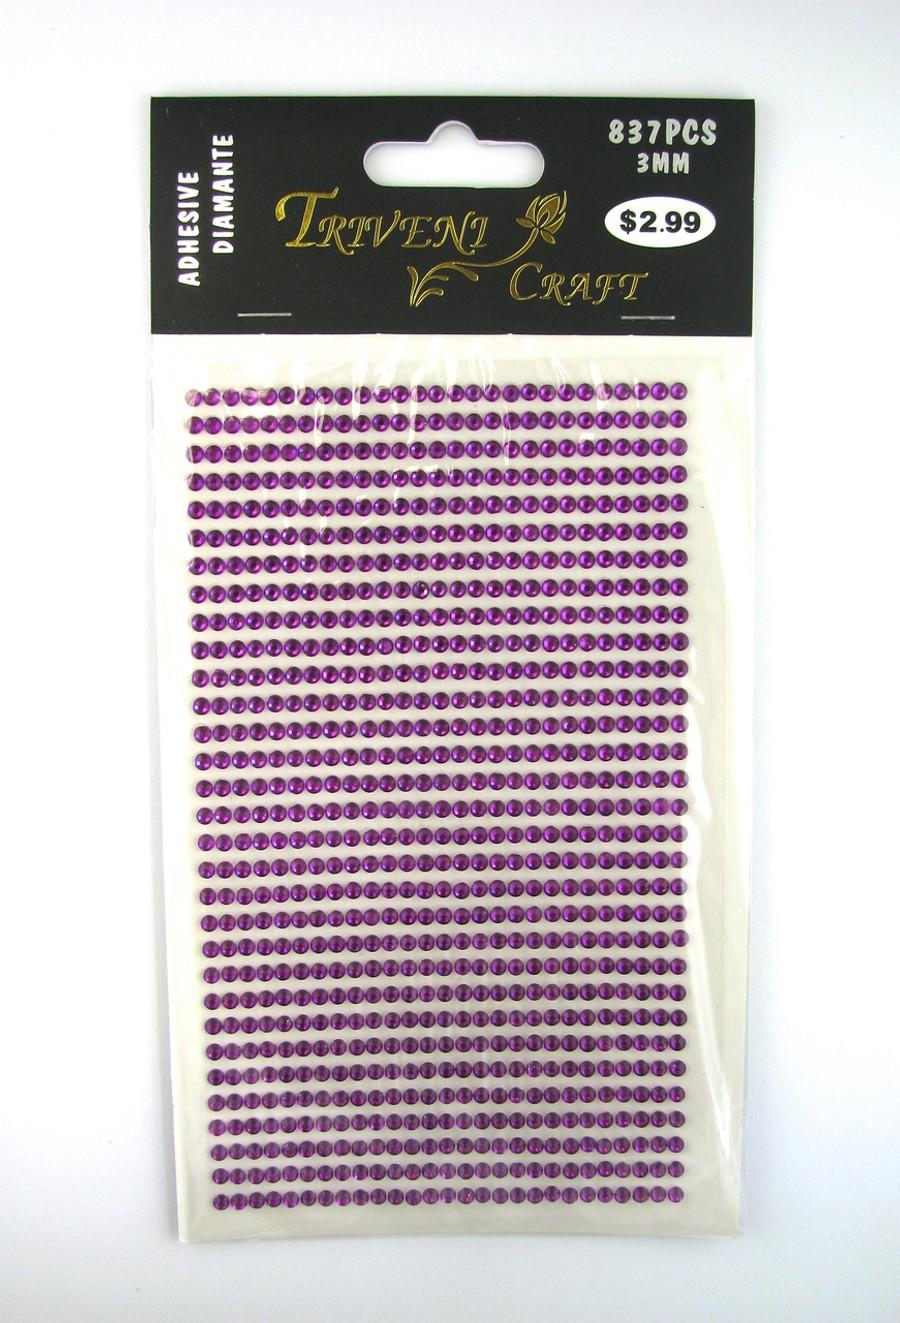 3mm Purple Fuchsia Flatback Rhinestones (837 pcs) Self-Adhesive - Easy Peel Strips